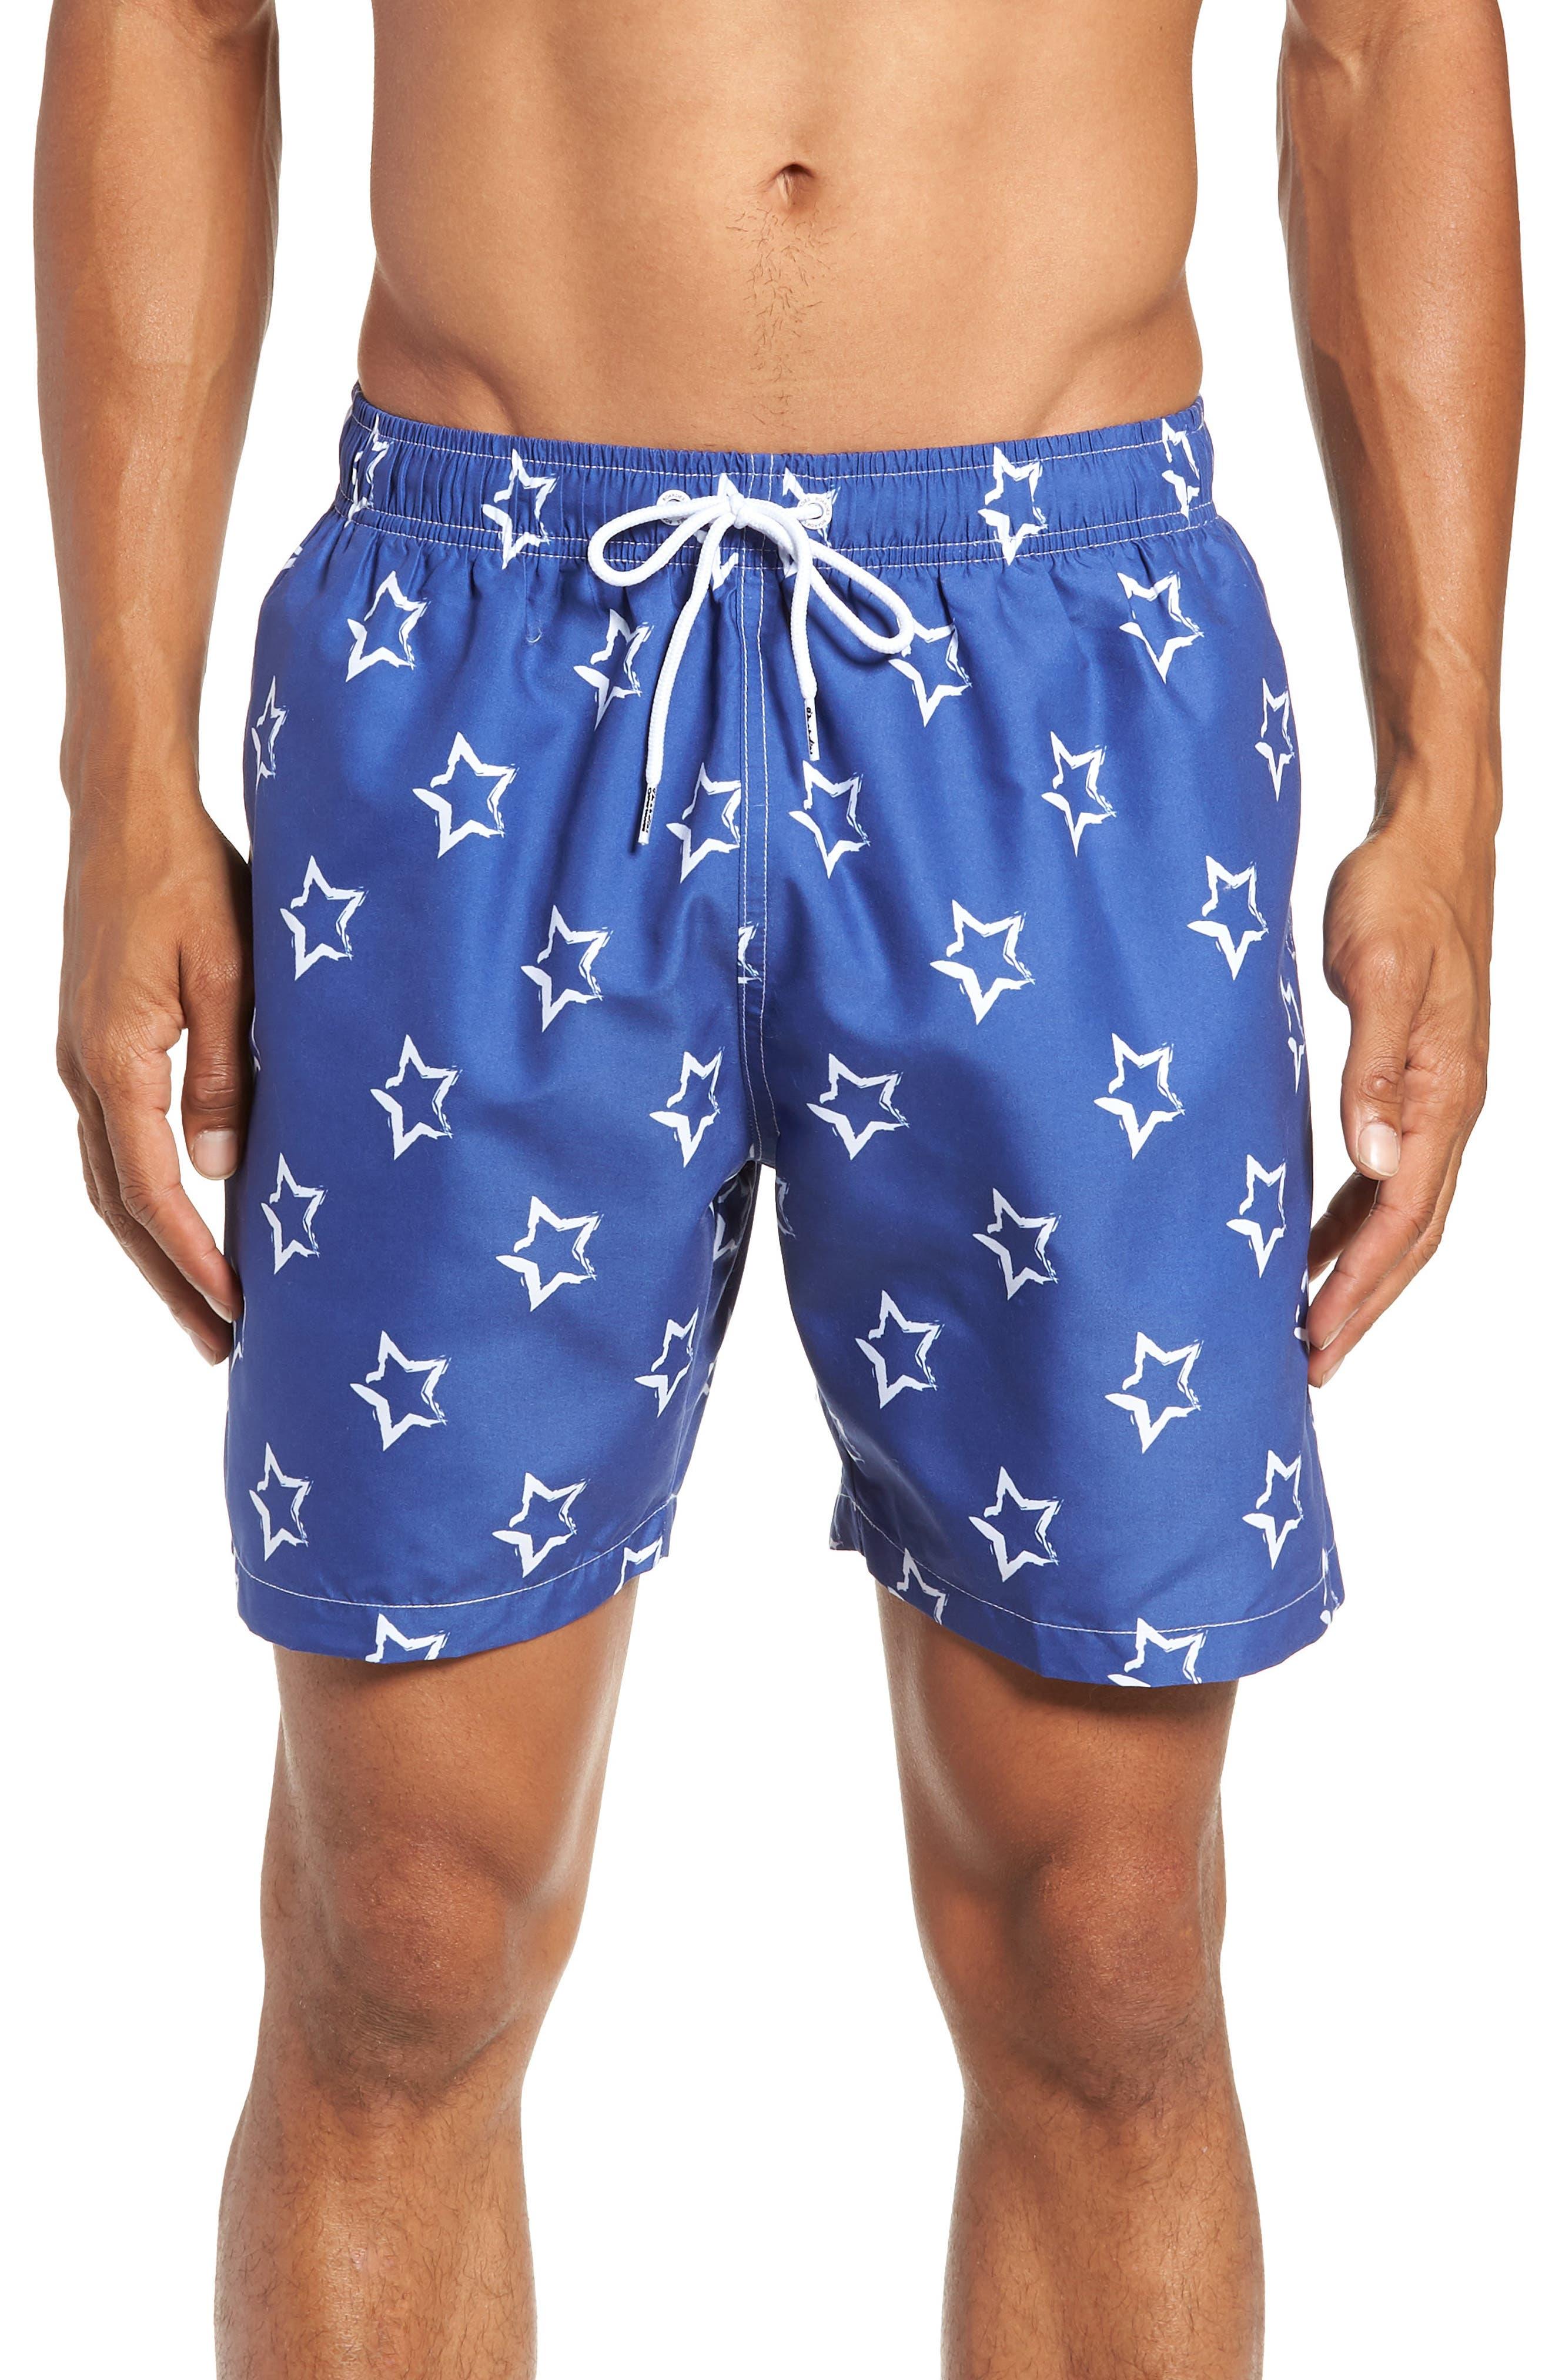 Star Print Swim Trunks,                         Main,                         color, BLUE